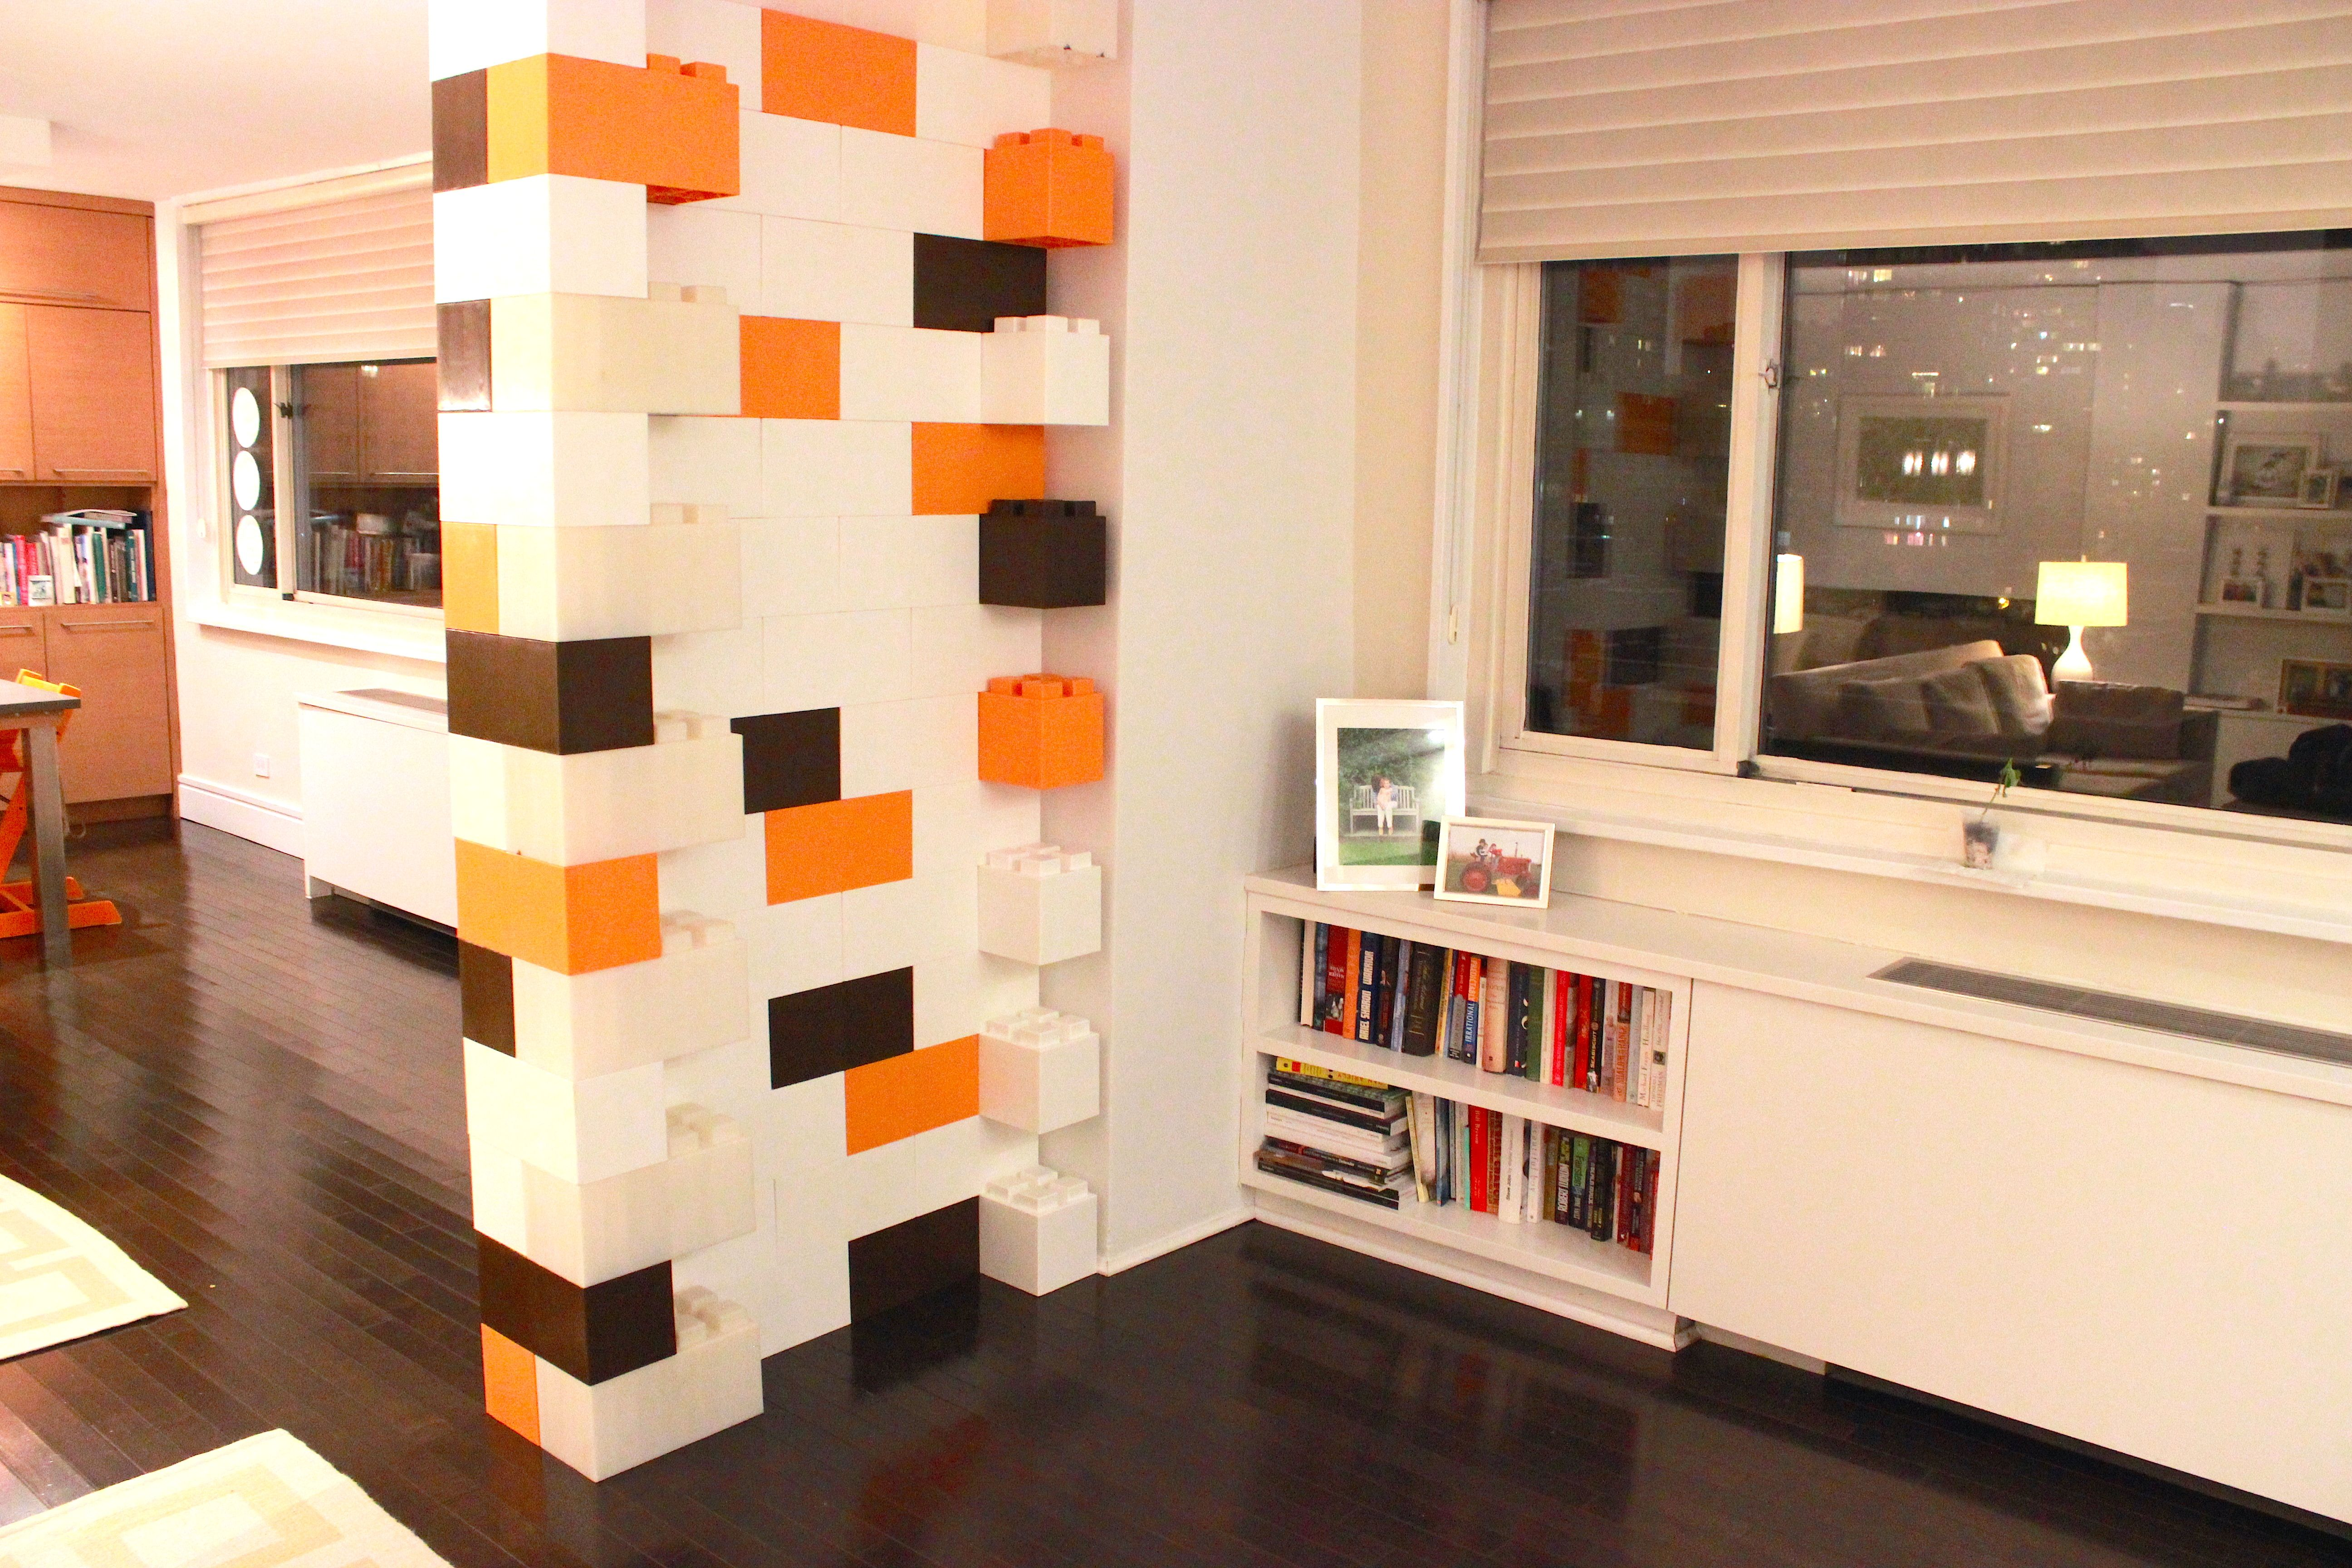 Modular Wall Built From Everblock Room Divider Blocks Colorful